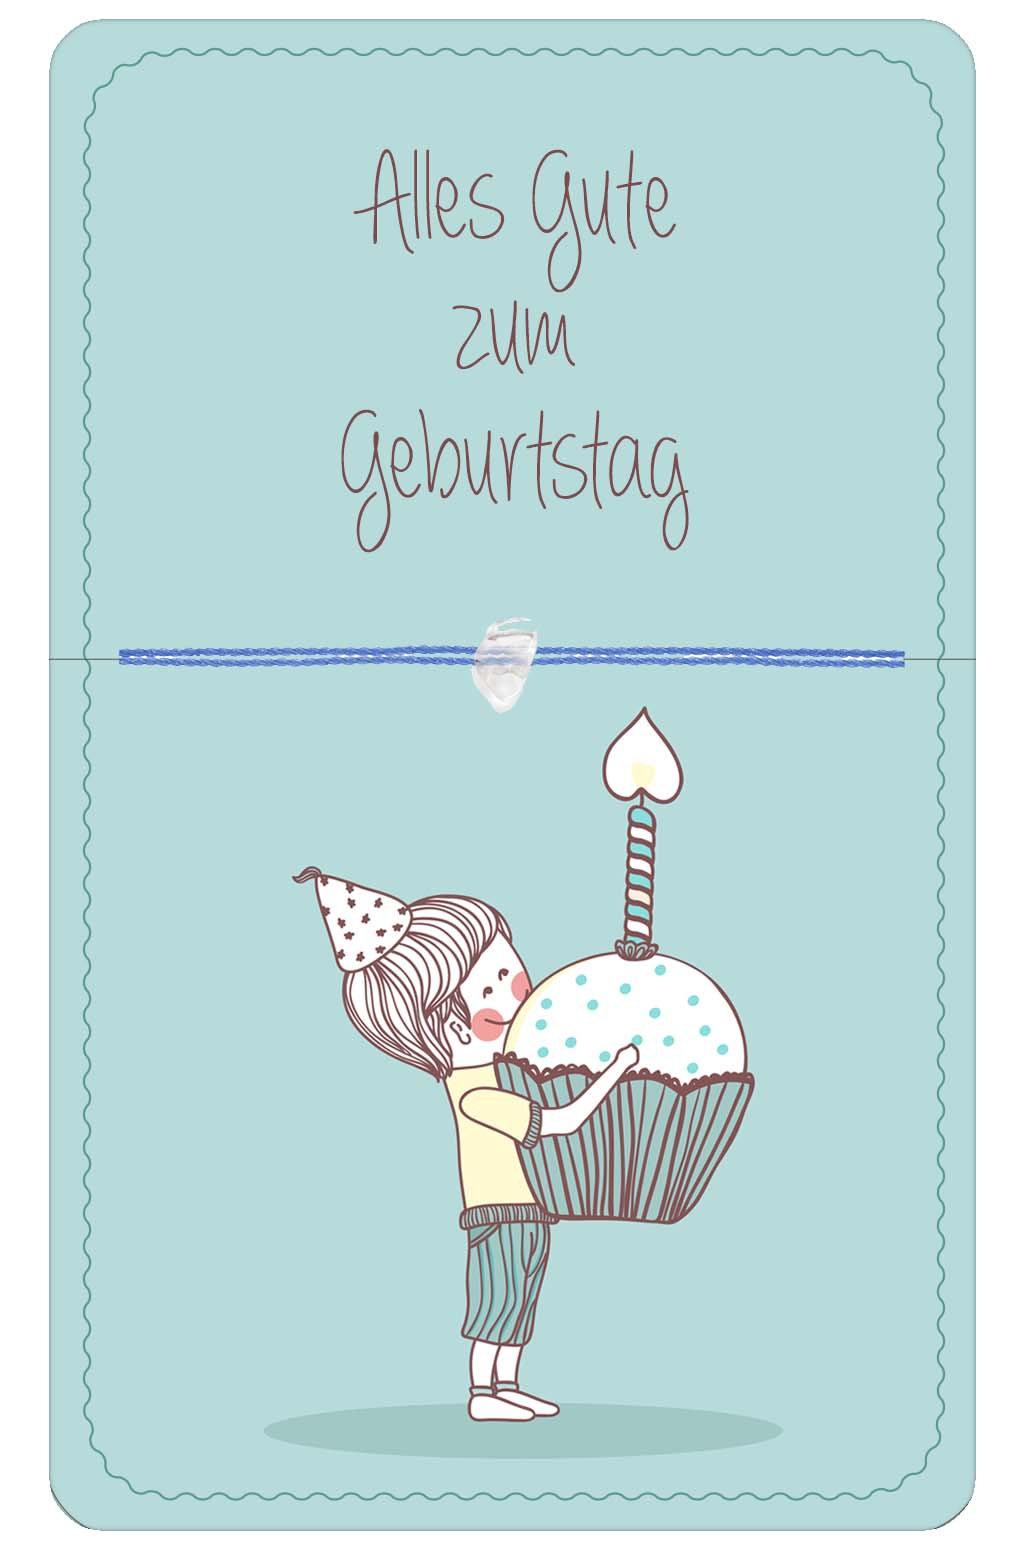 Geburtstags Wunsch